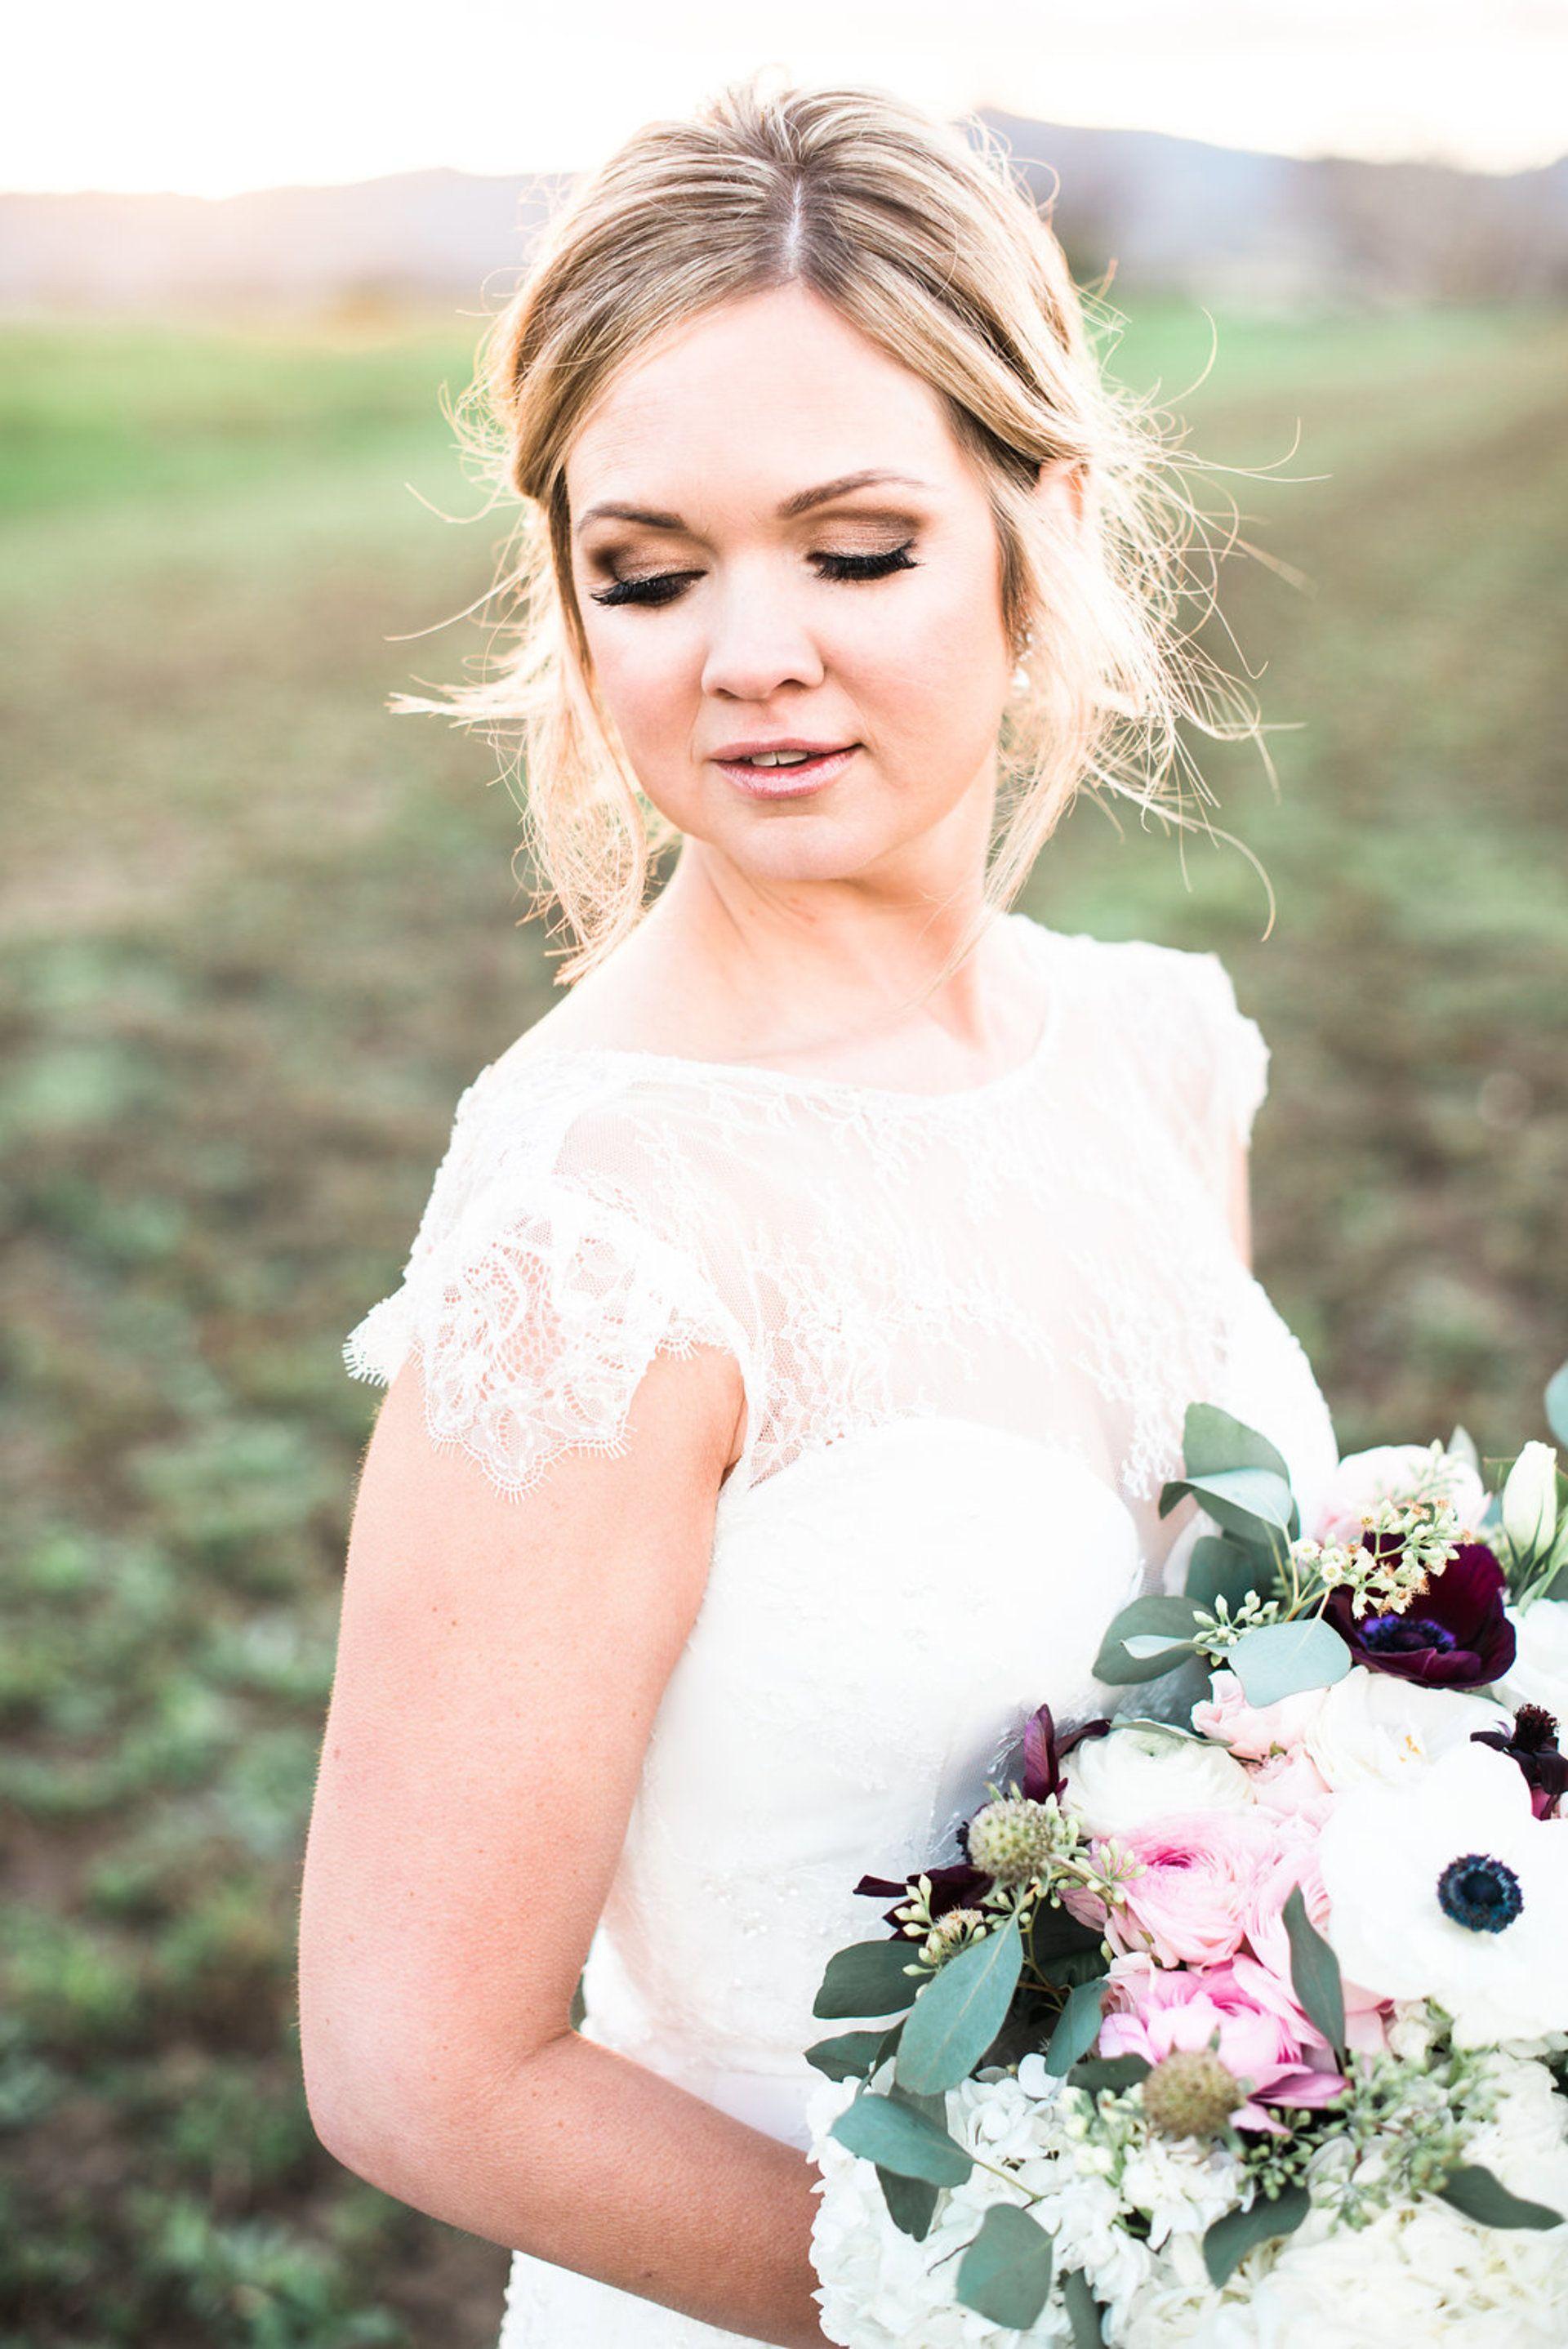 Natural Winter Wedding in Napa | Smoky eye, Copper eyeshadow and ...